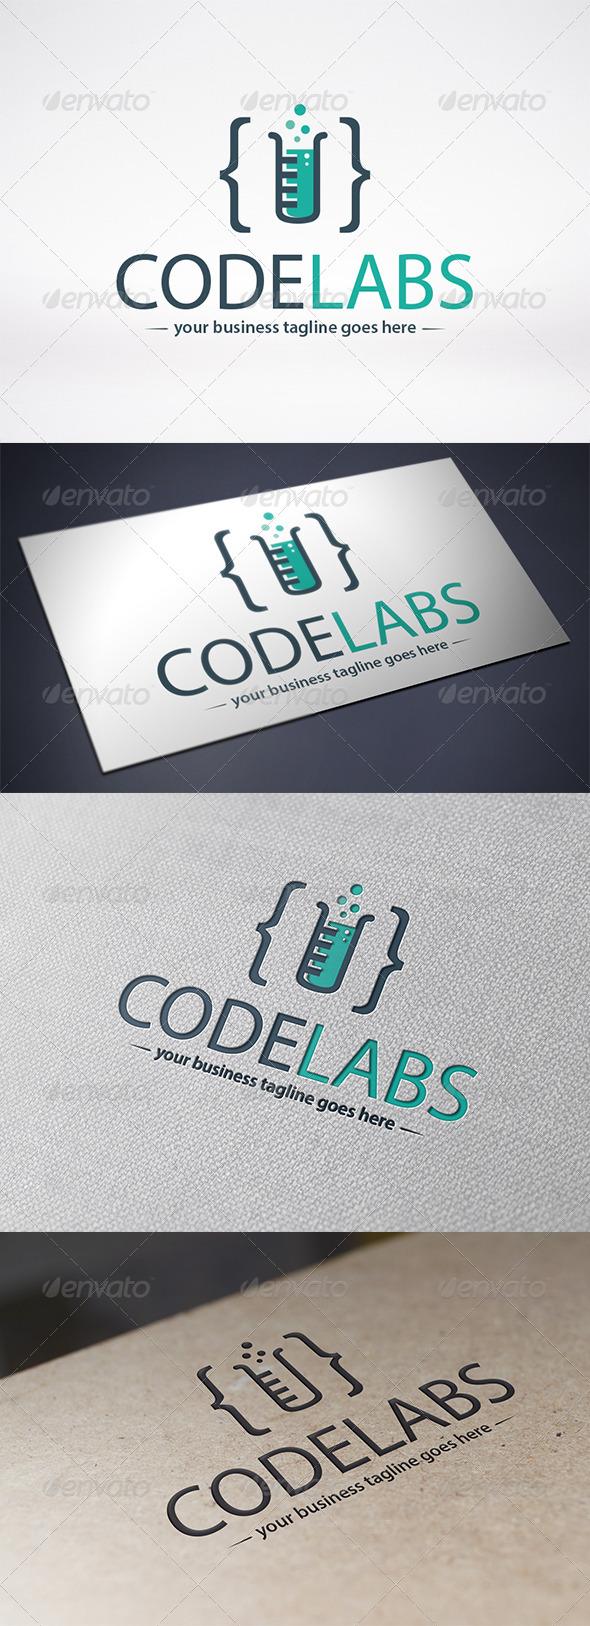 Code Lab Logo Template - Symbols Logo Templates